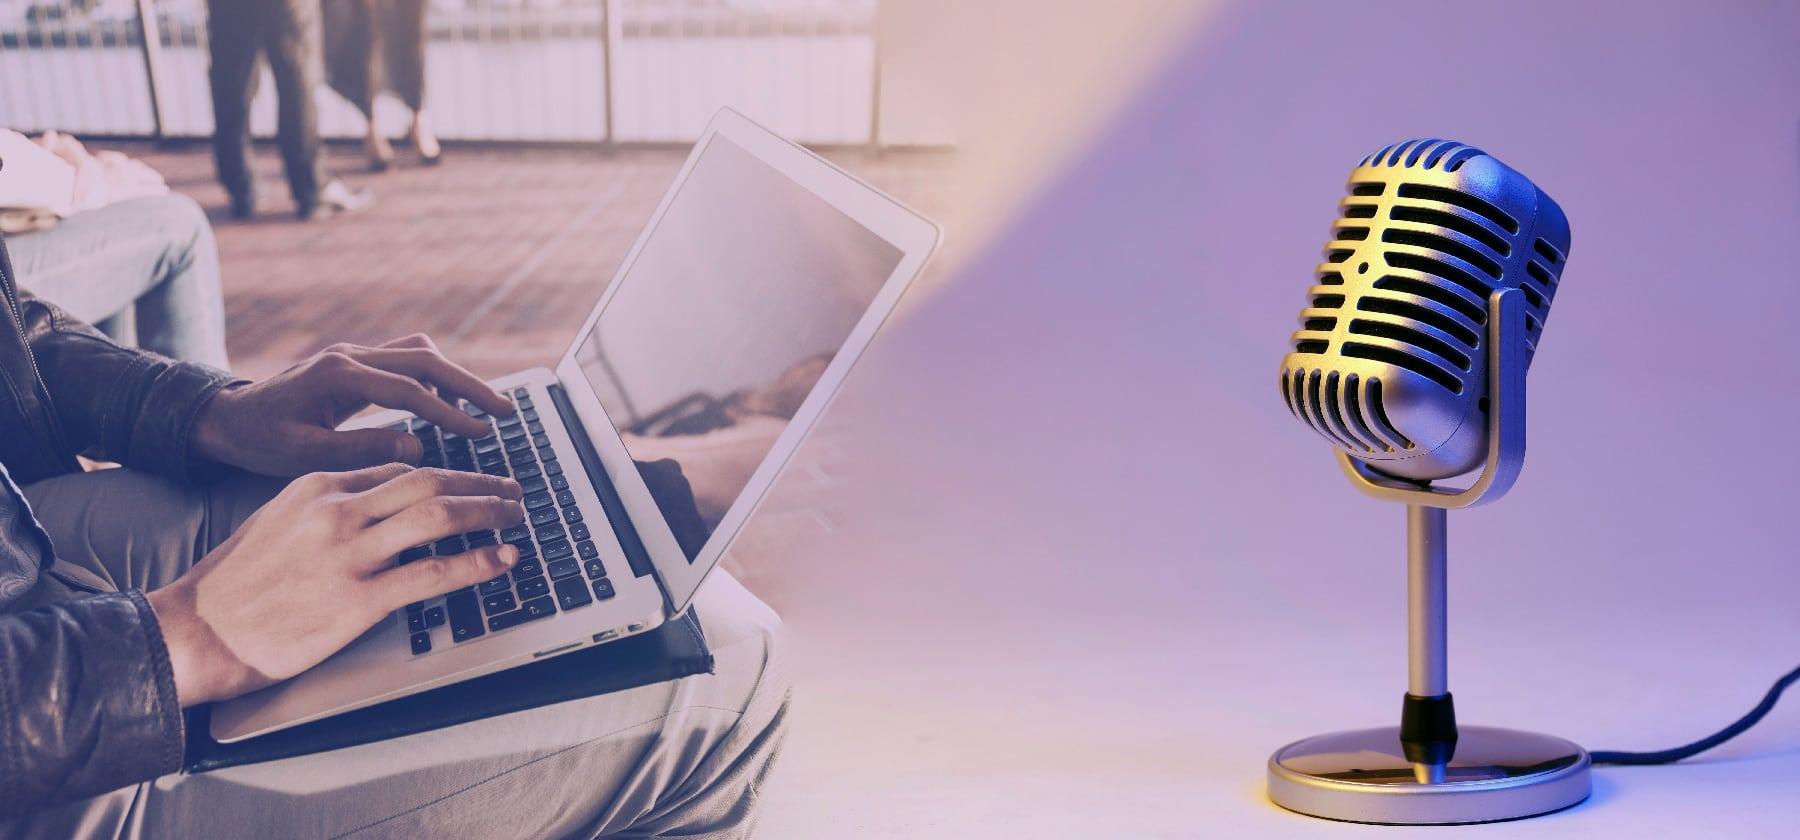 podcasts sobre programación en español